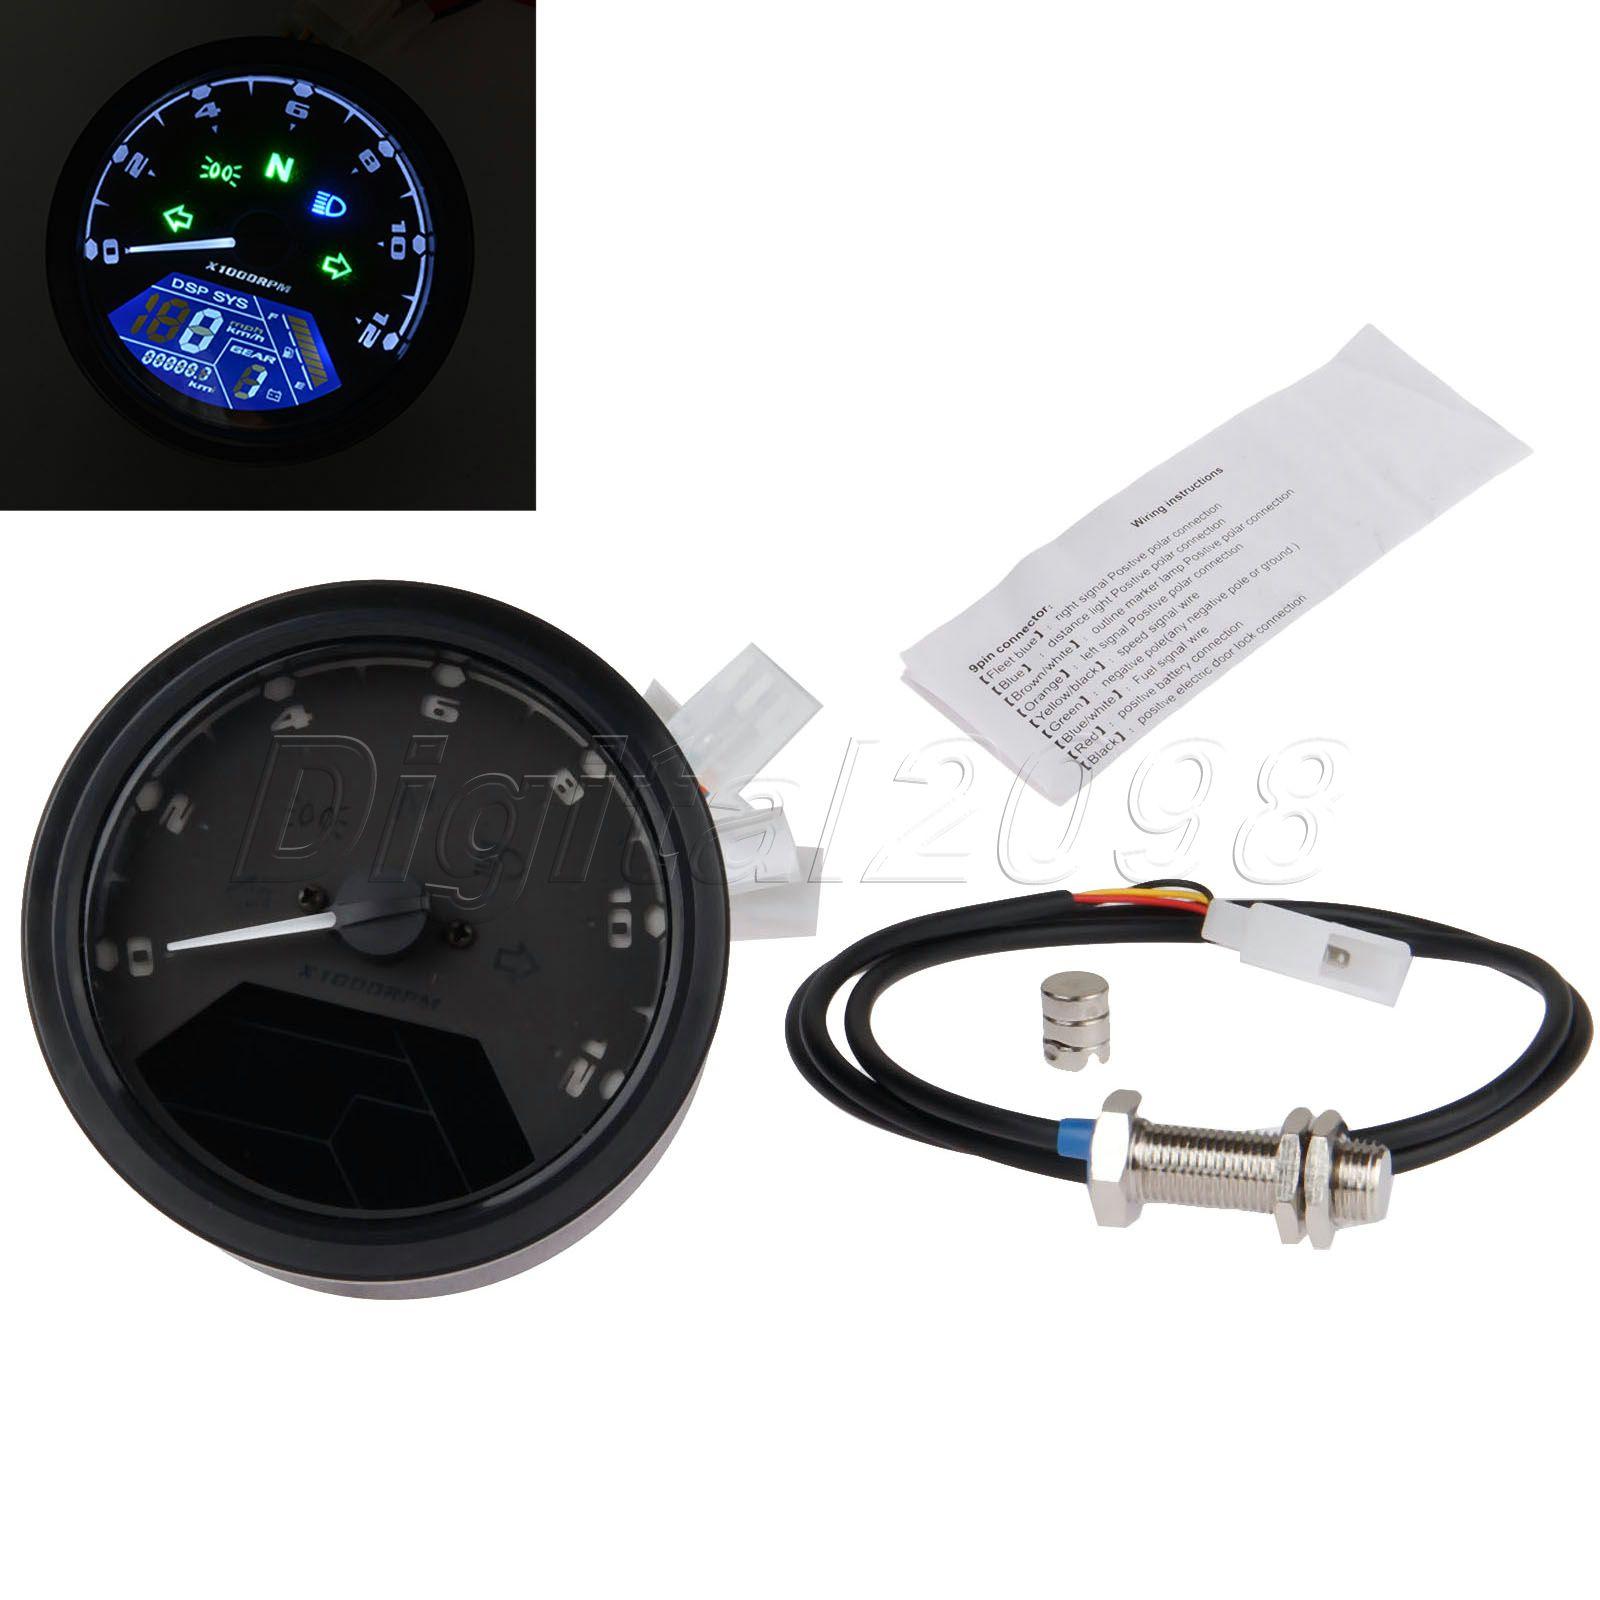 medium resolution of yetaha lcd digital tachometer speedometer odometer universal motorcycle motorbike 12000rpm tachometer motorcycle accessories in instruments from automobiles